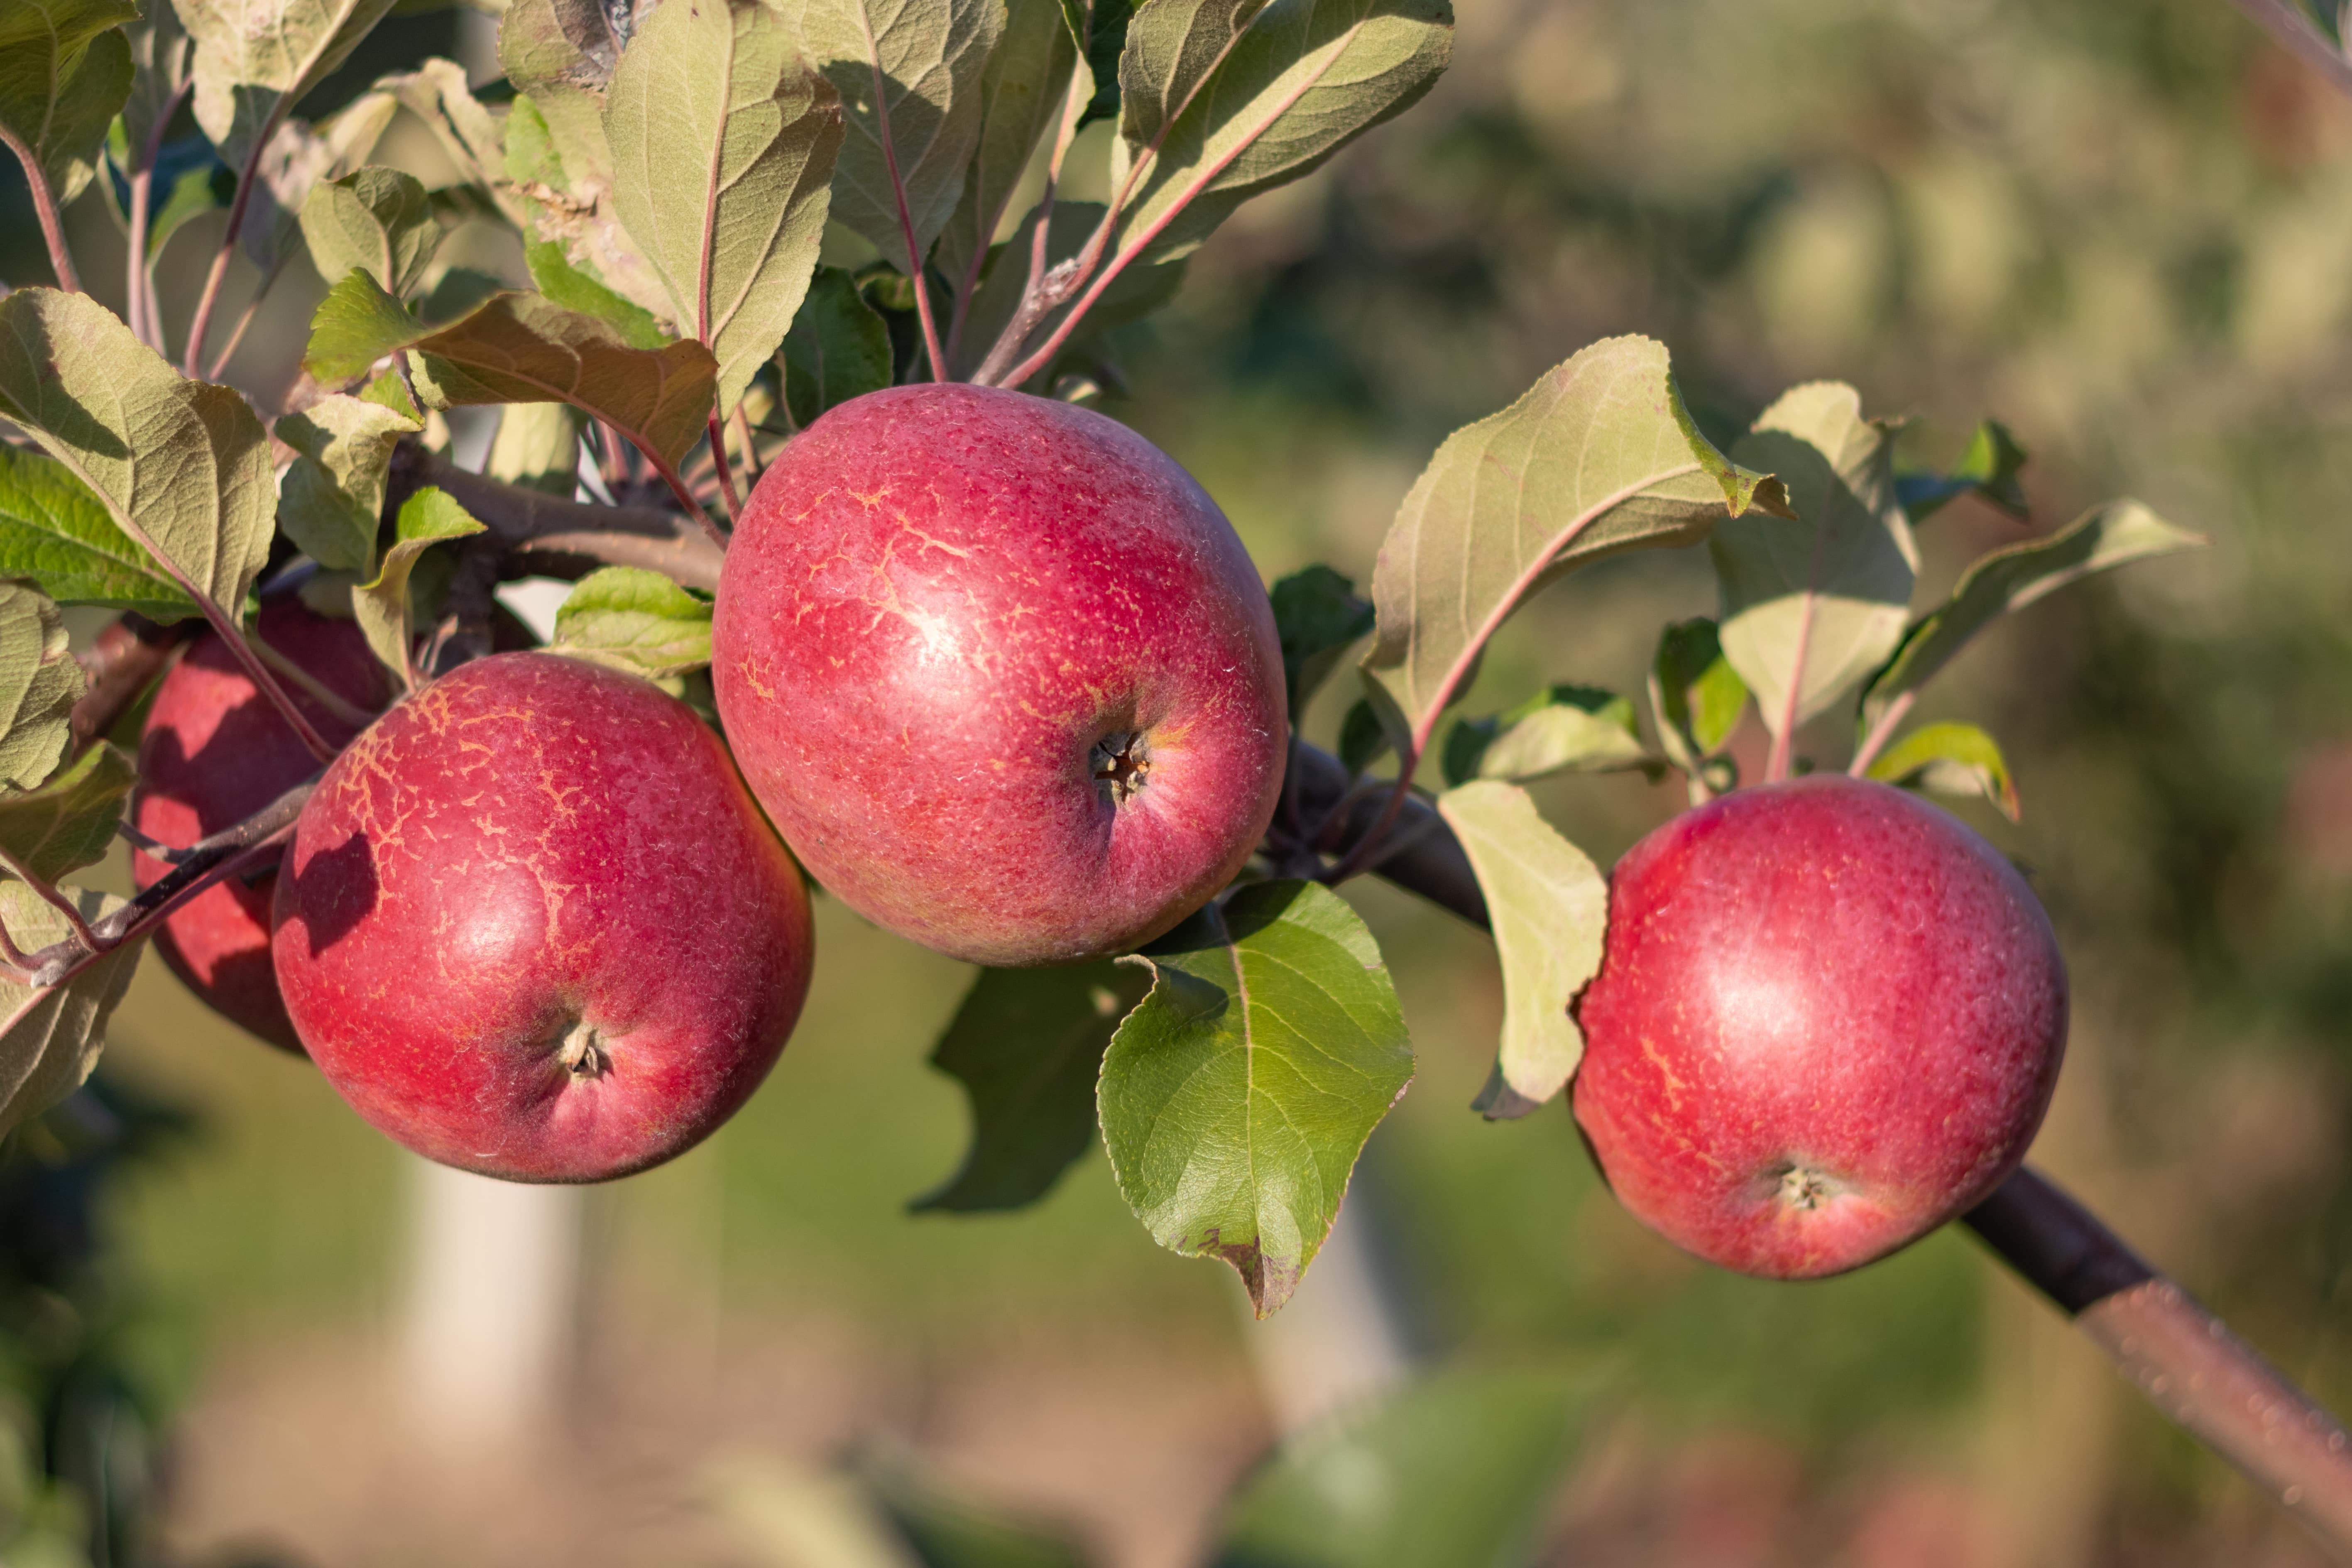 tolochin jabloki min - Сбор яблок в садах Толочинского района (видео)